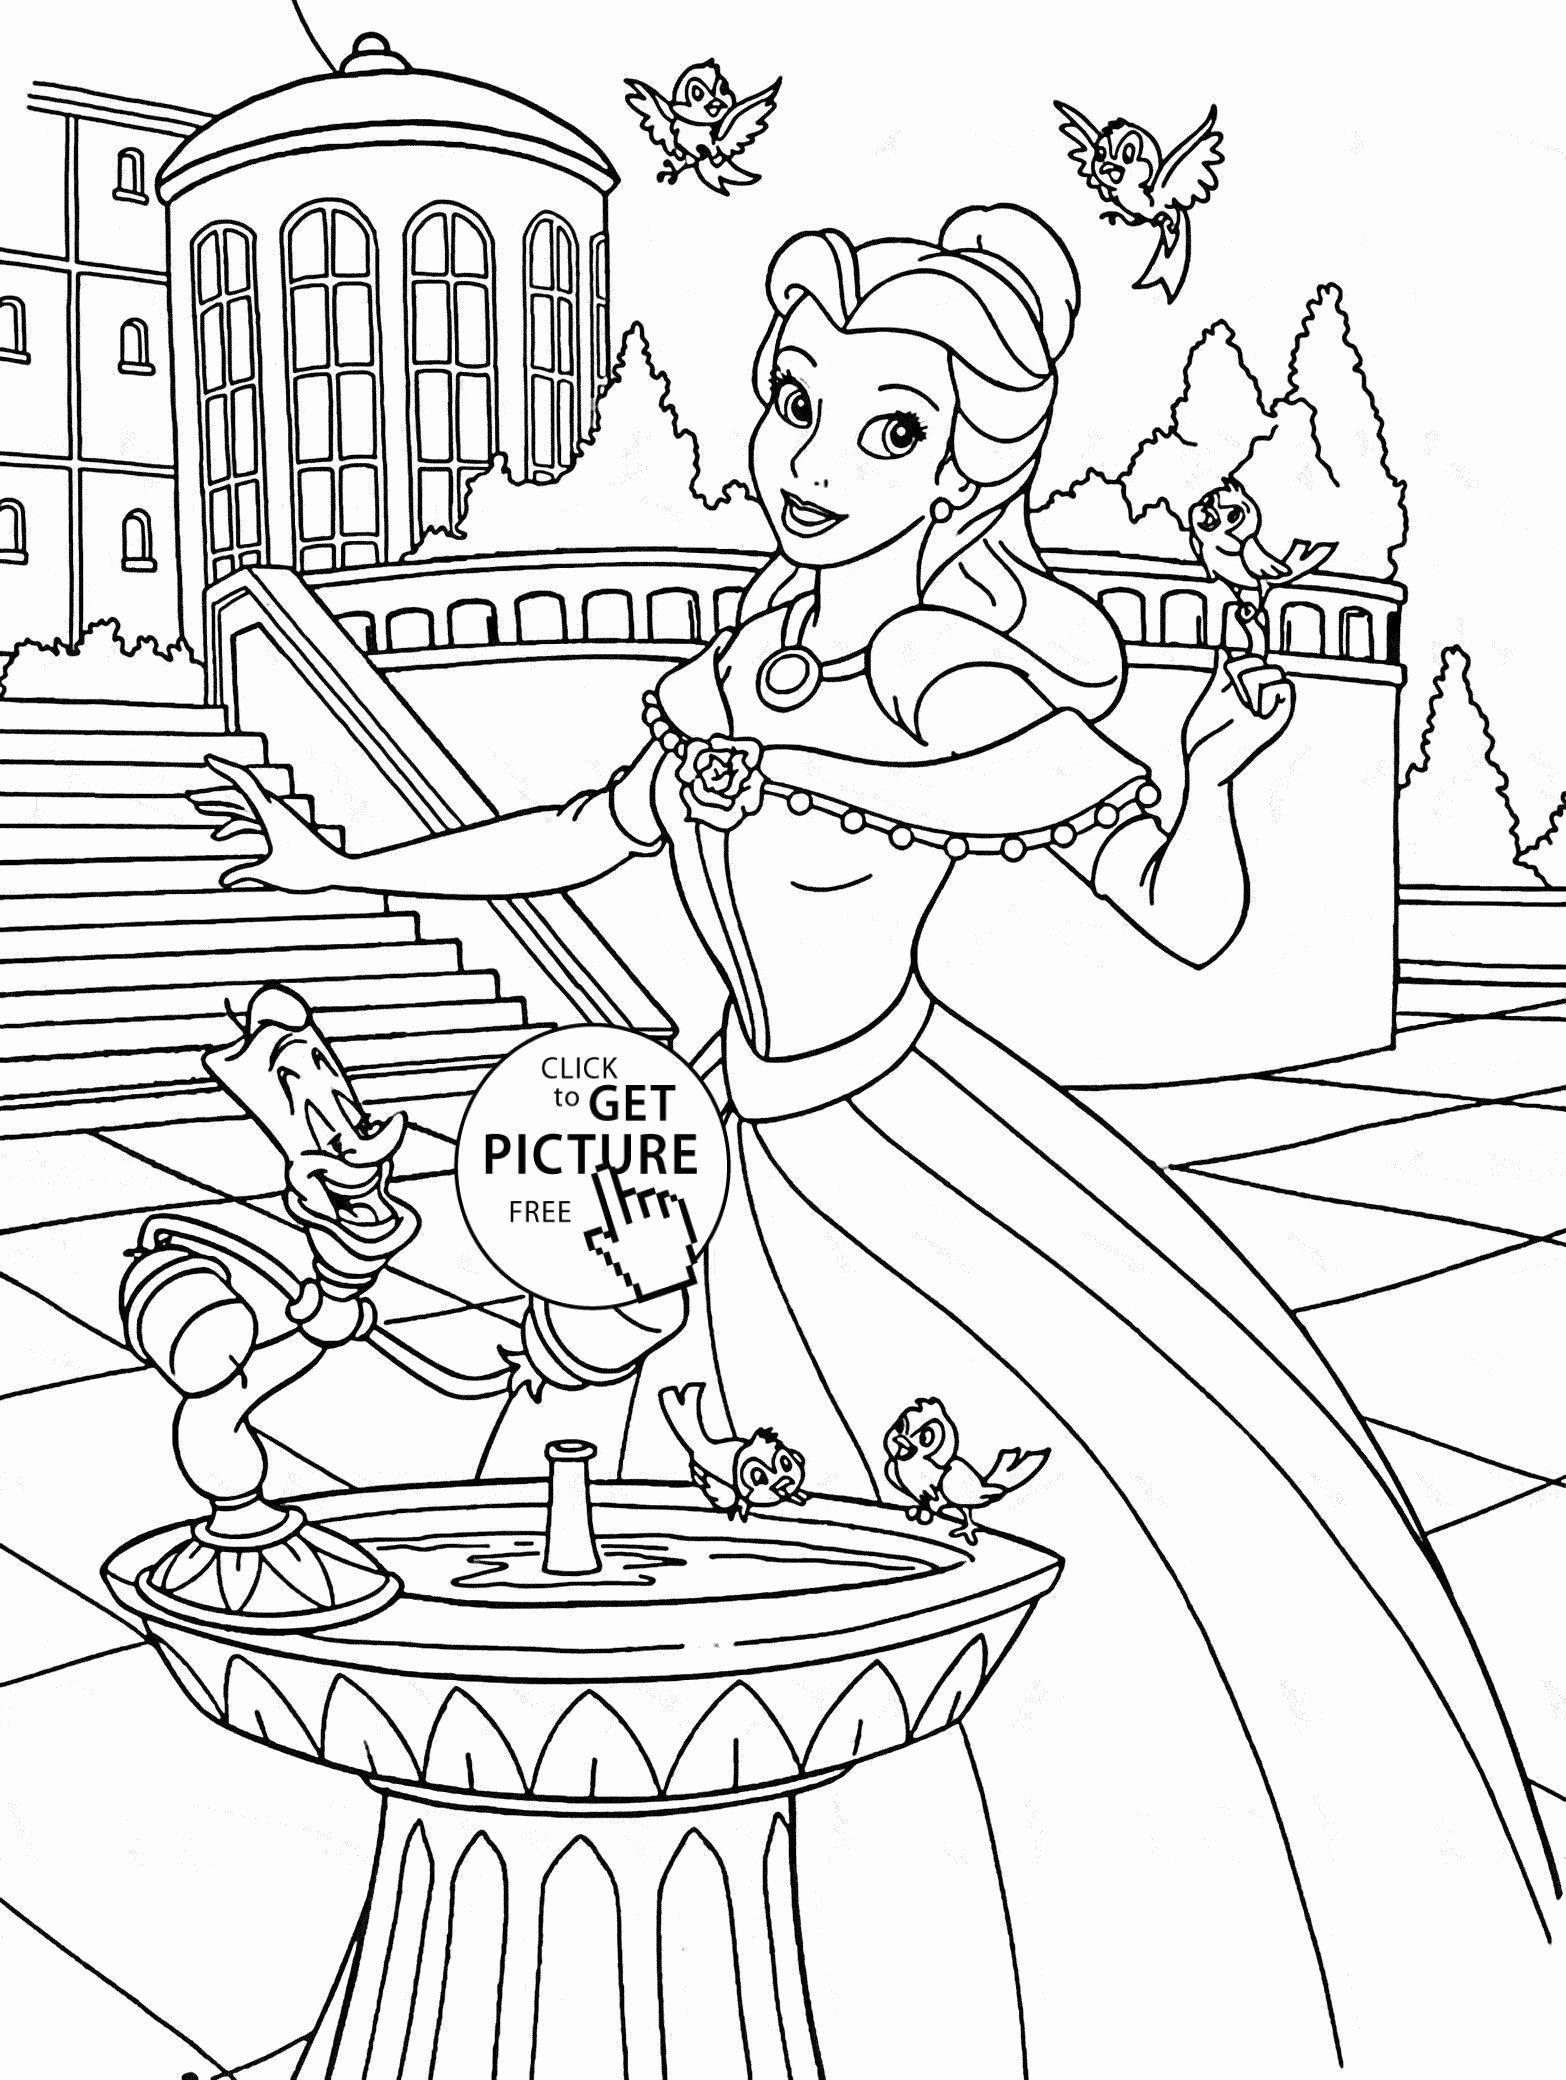 Disney Jasmine Coloring Pages Inspirational Disney Princesses Coloring Pages Awesome Fresh Disney Buku Mewarnai Disney Warna